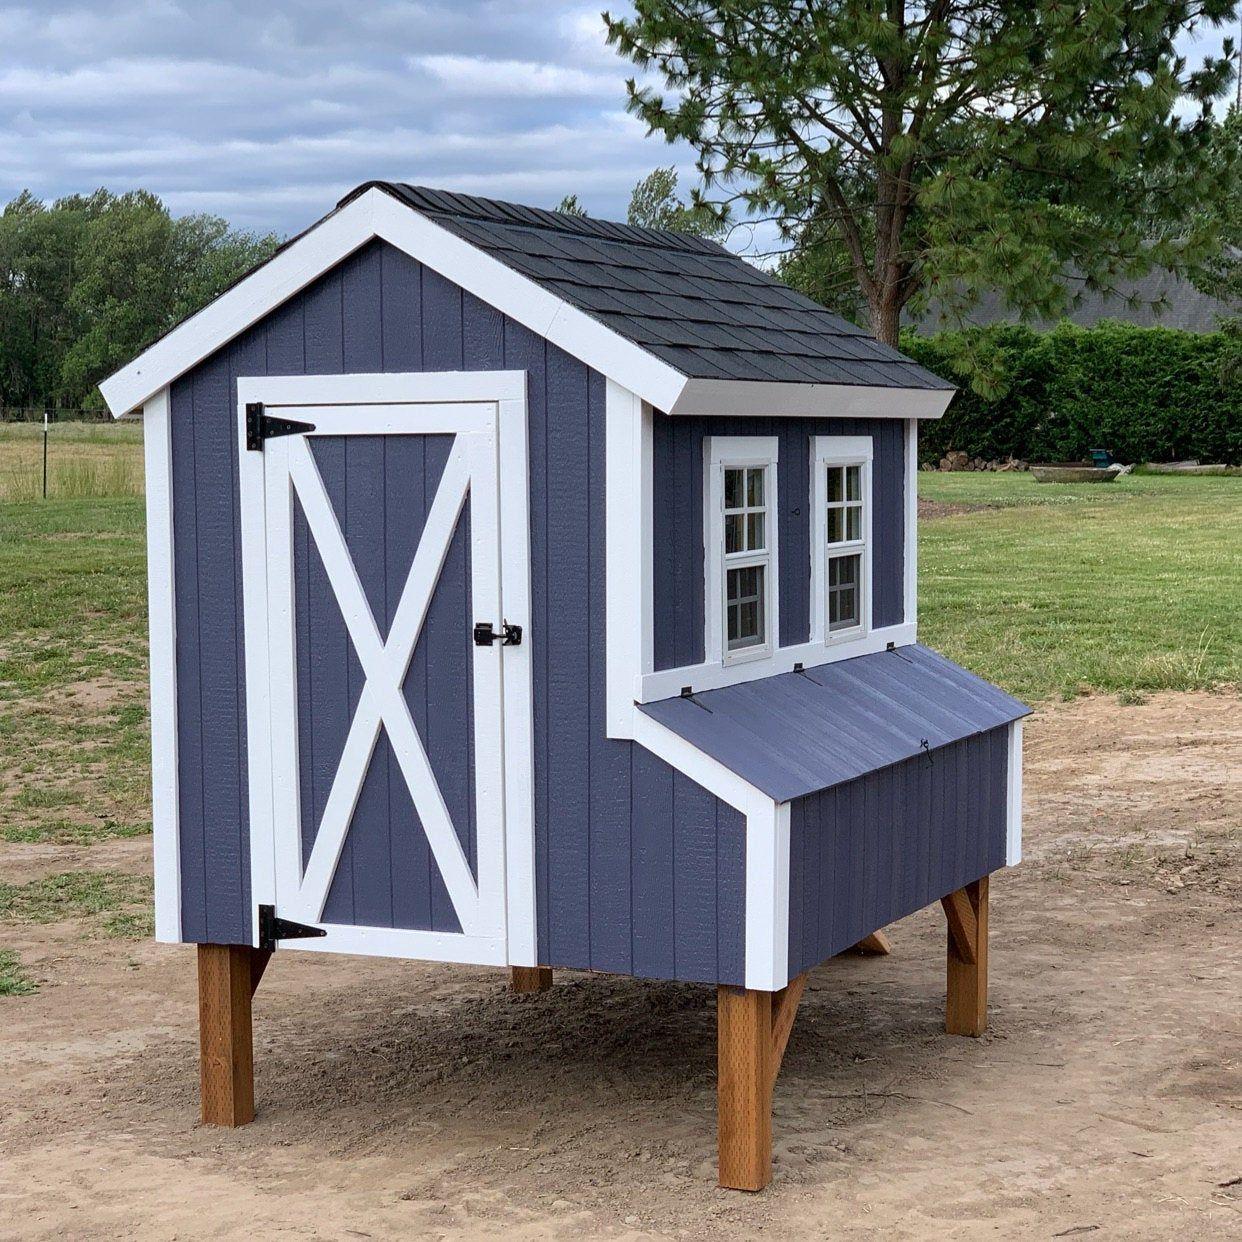 Chicken Coop Plans Pdf File Instant Download In 2021 Diy Chicken Coop Plans Diy Chicken Coop Chicken Coop Plans Backyard chicken coop plans pdf